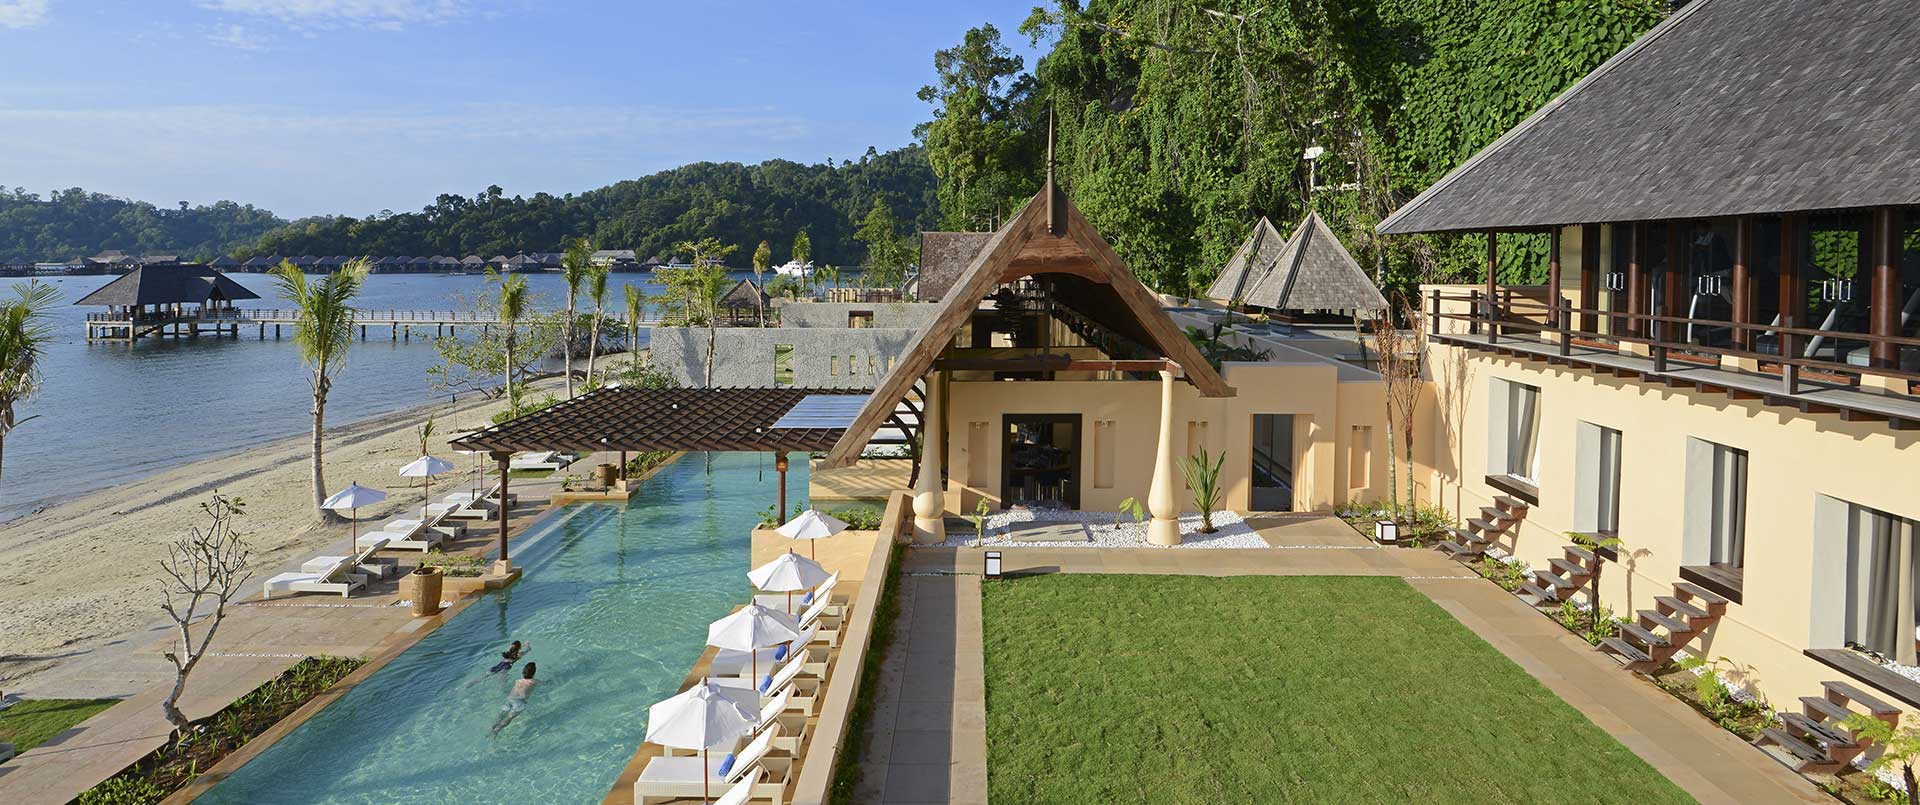 Gaya Island Resort, Gaya Island